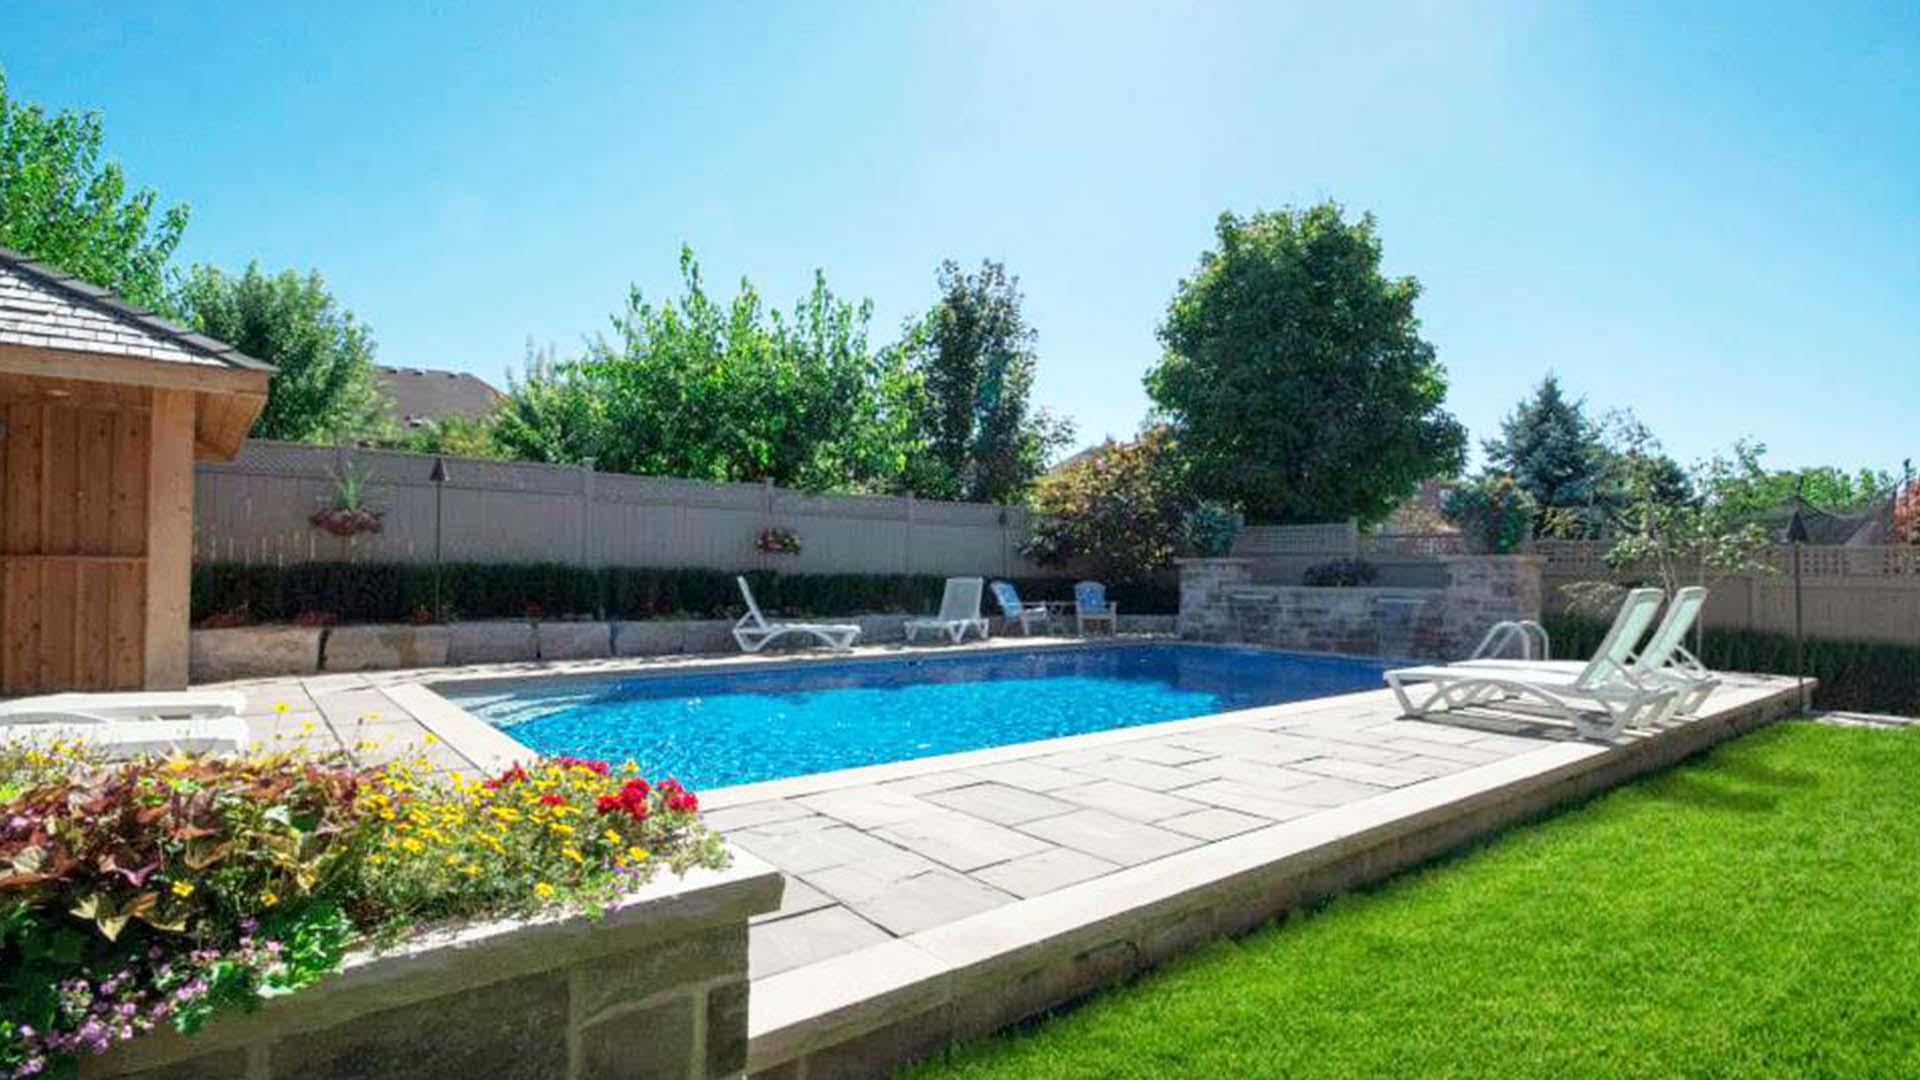 Bradford Pool Installations